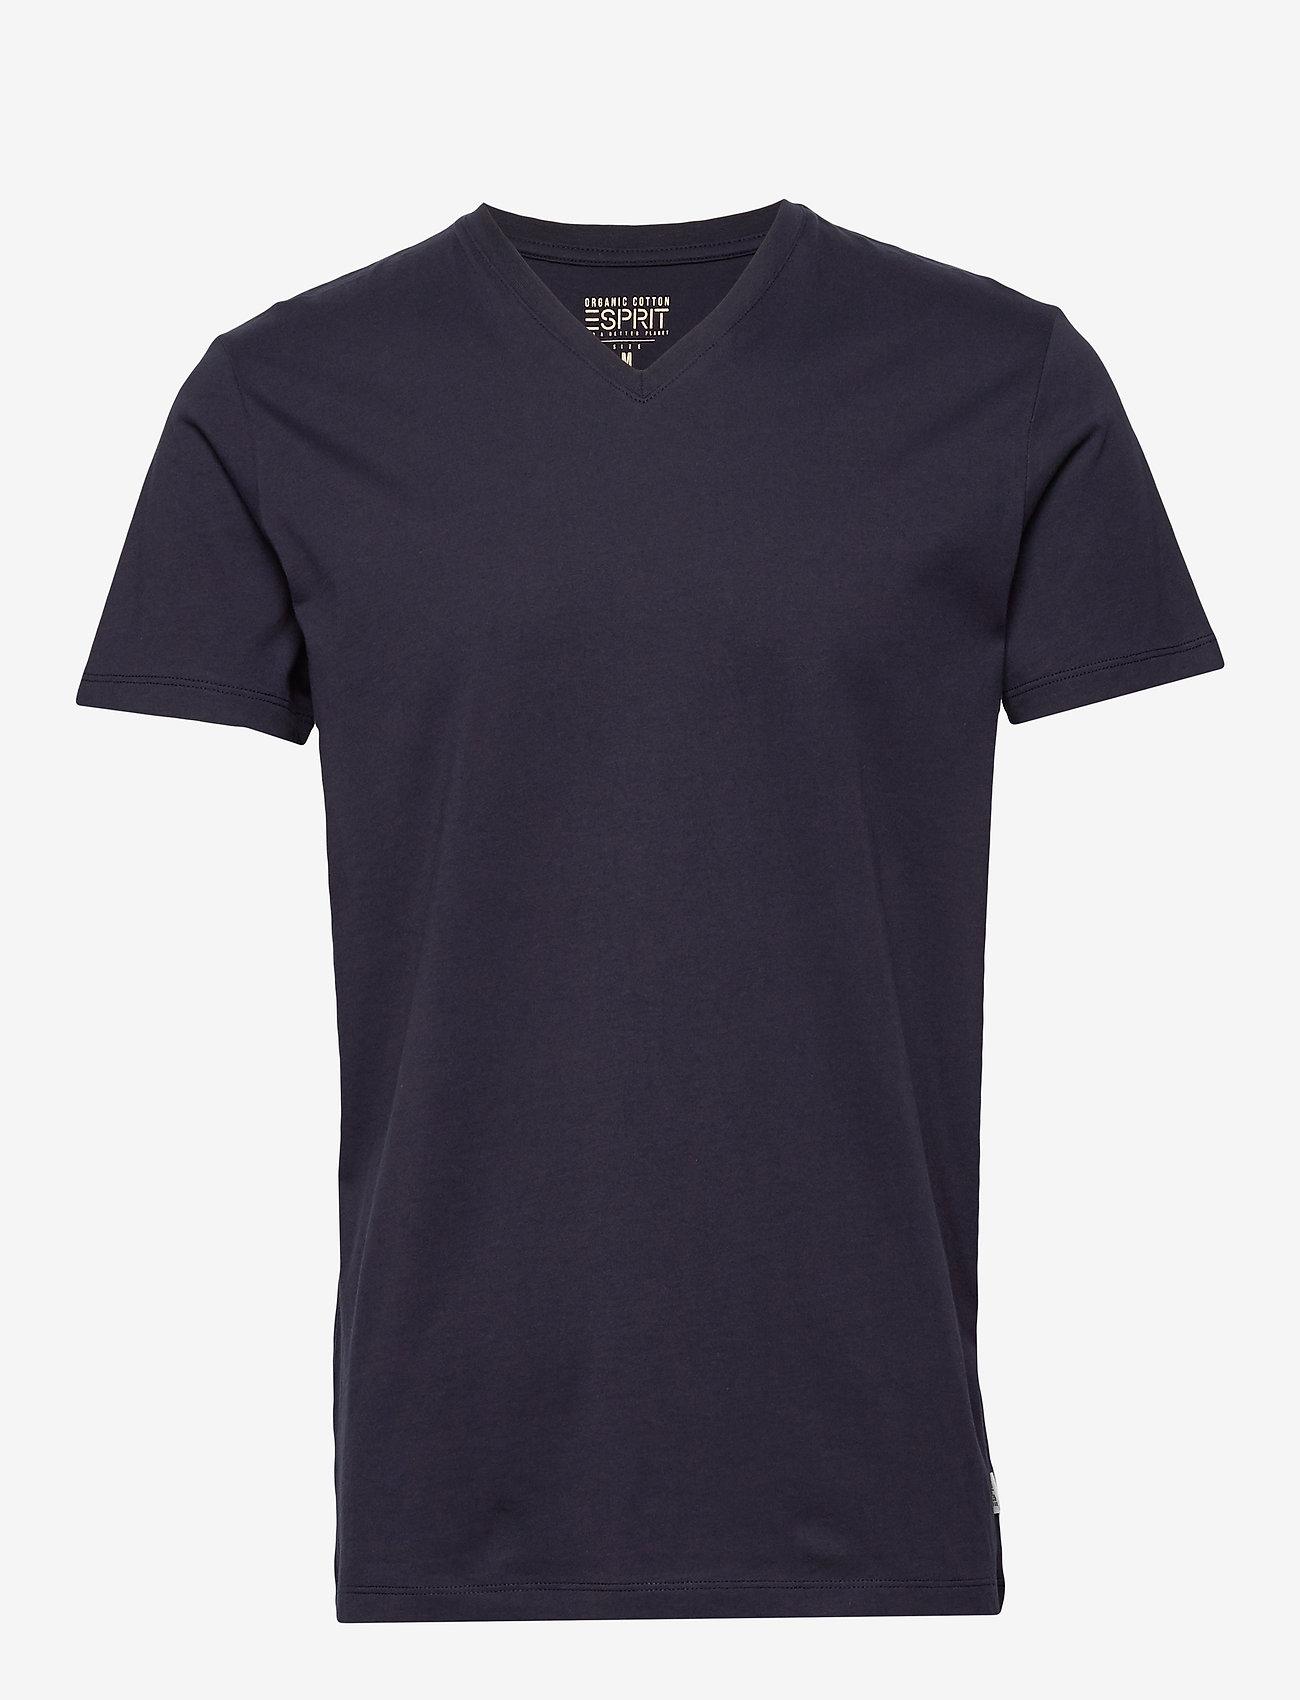 Esprit Casual - T-Shirts - basic t-shirts - navy - 0